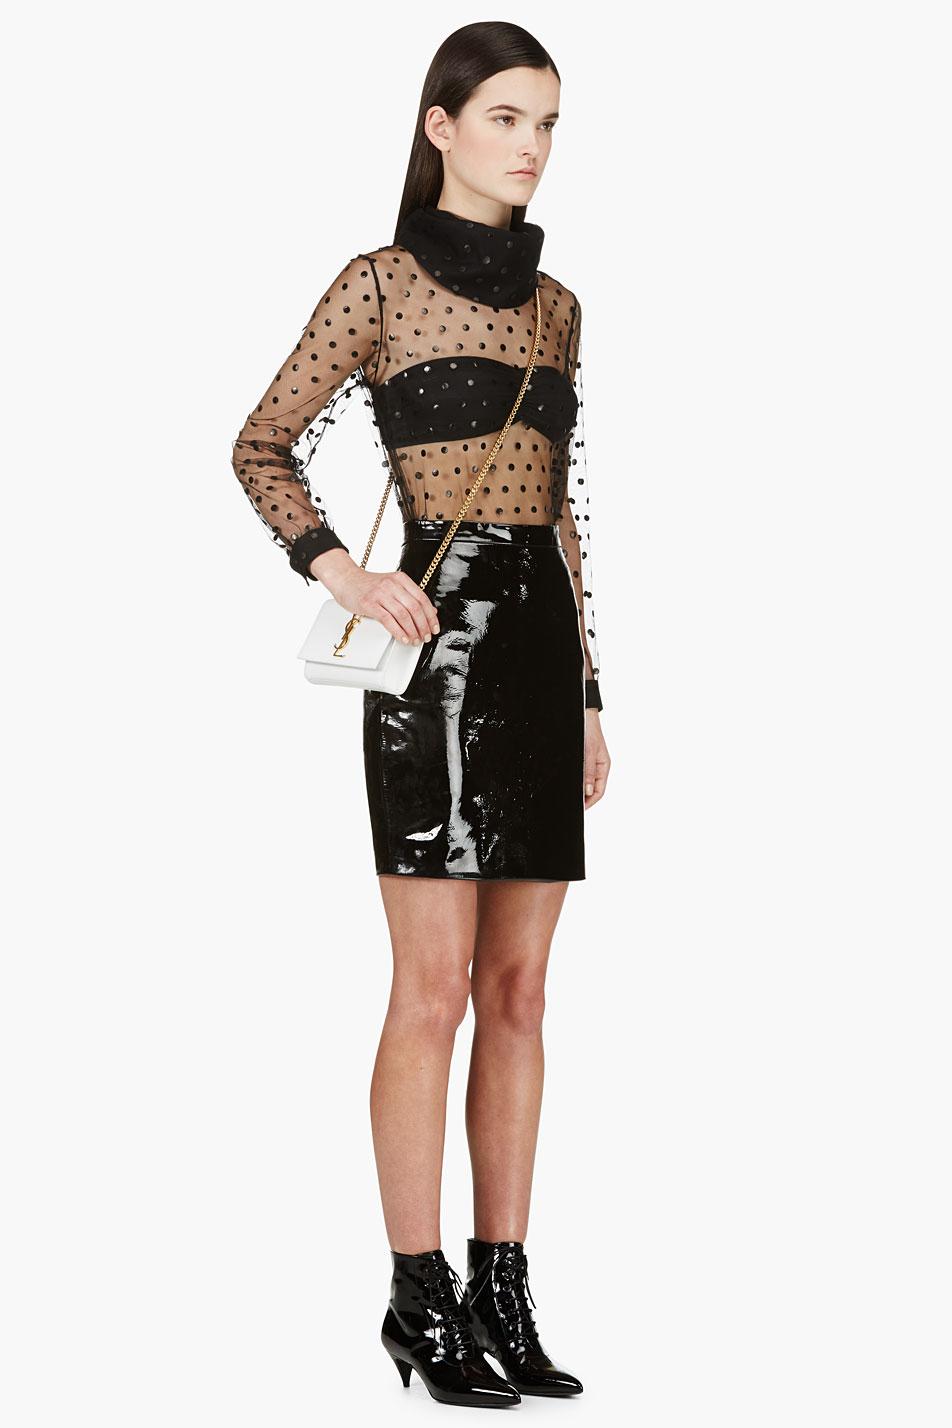 Saint laurent Black Patent Leather Mini Skirt in Black | Lyst